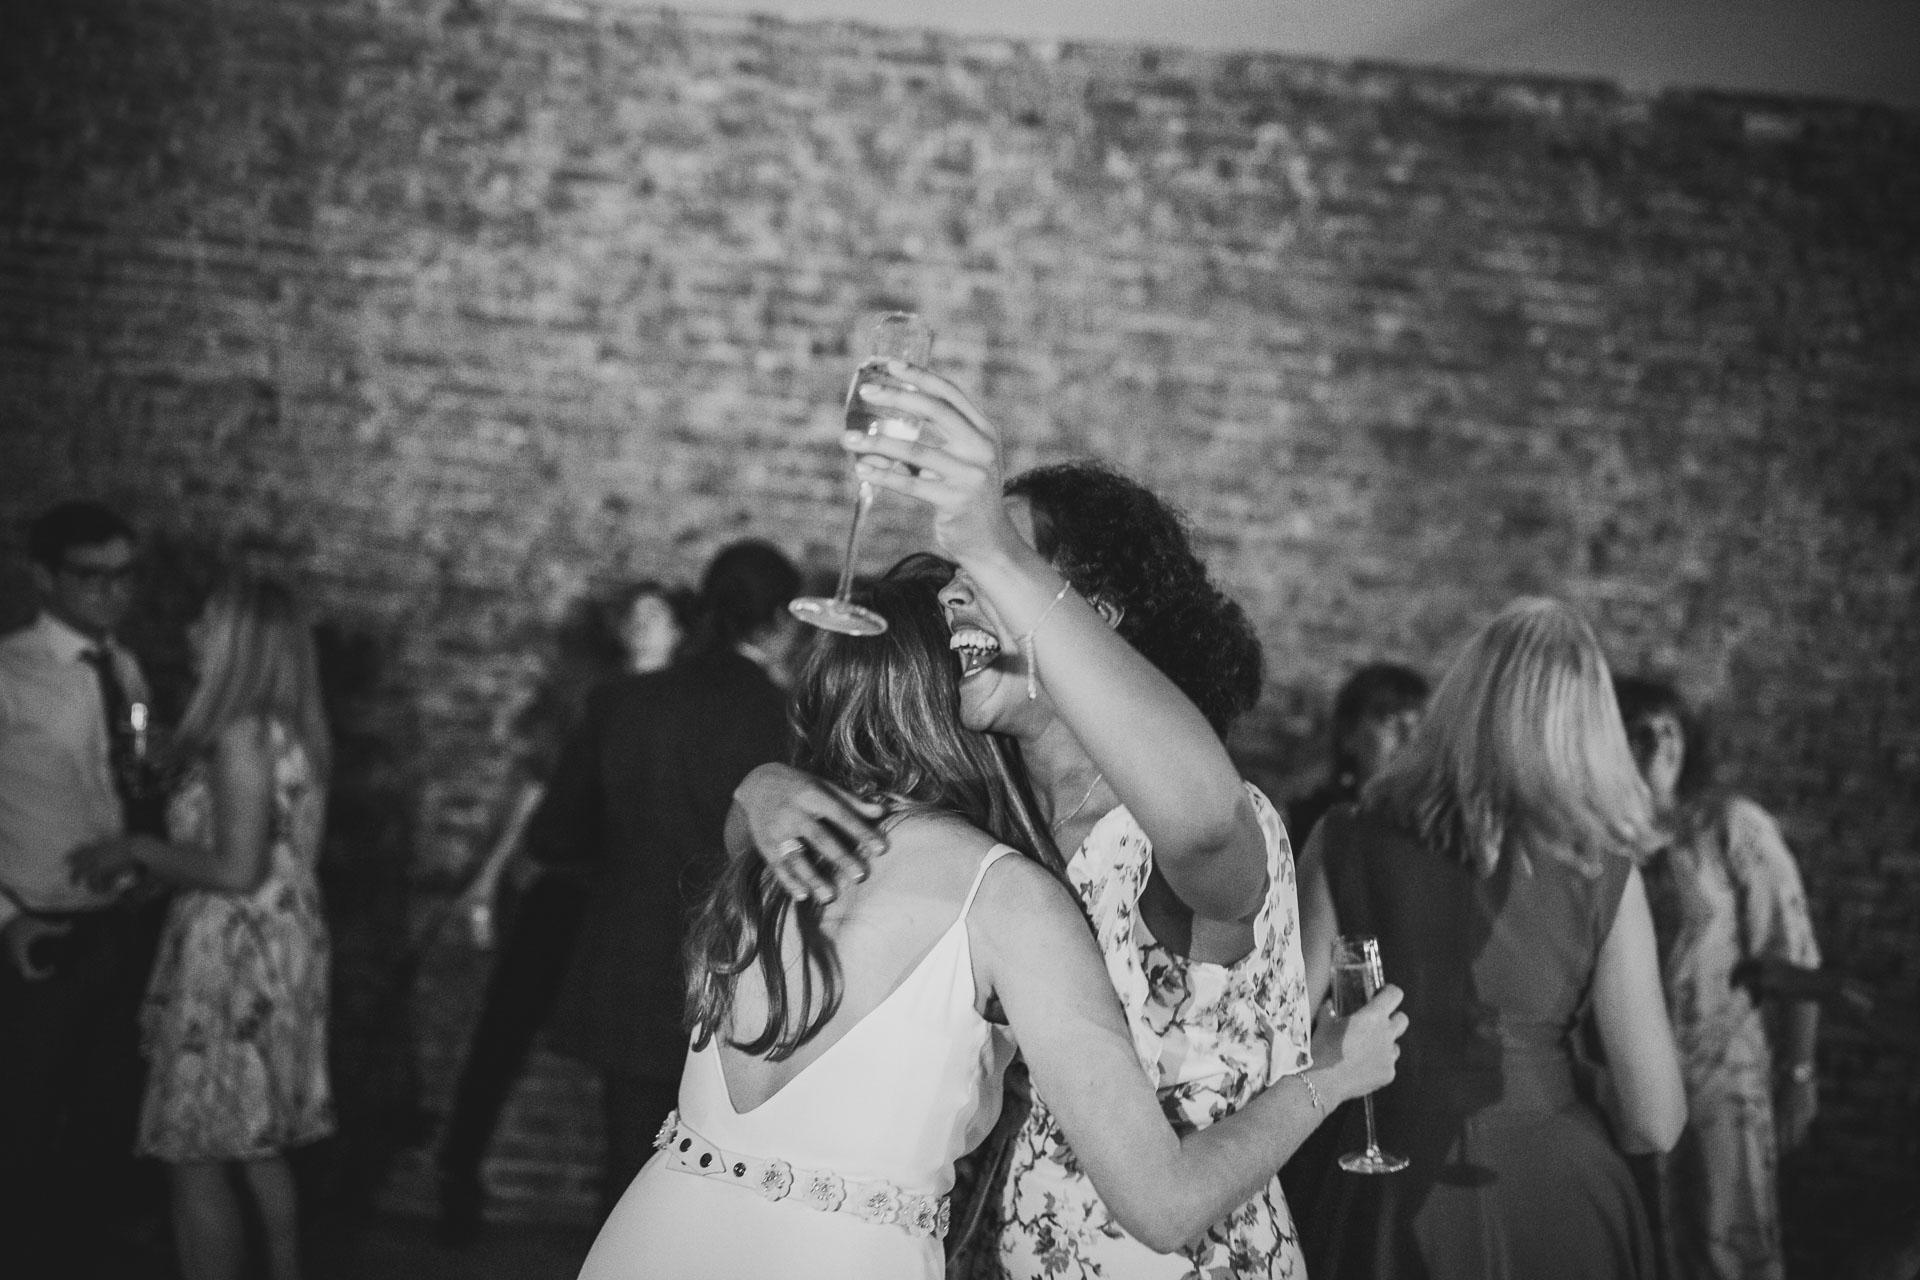 middleton_lodge_wedding_photographer-128.jpg